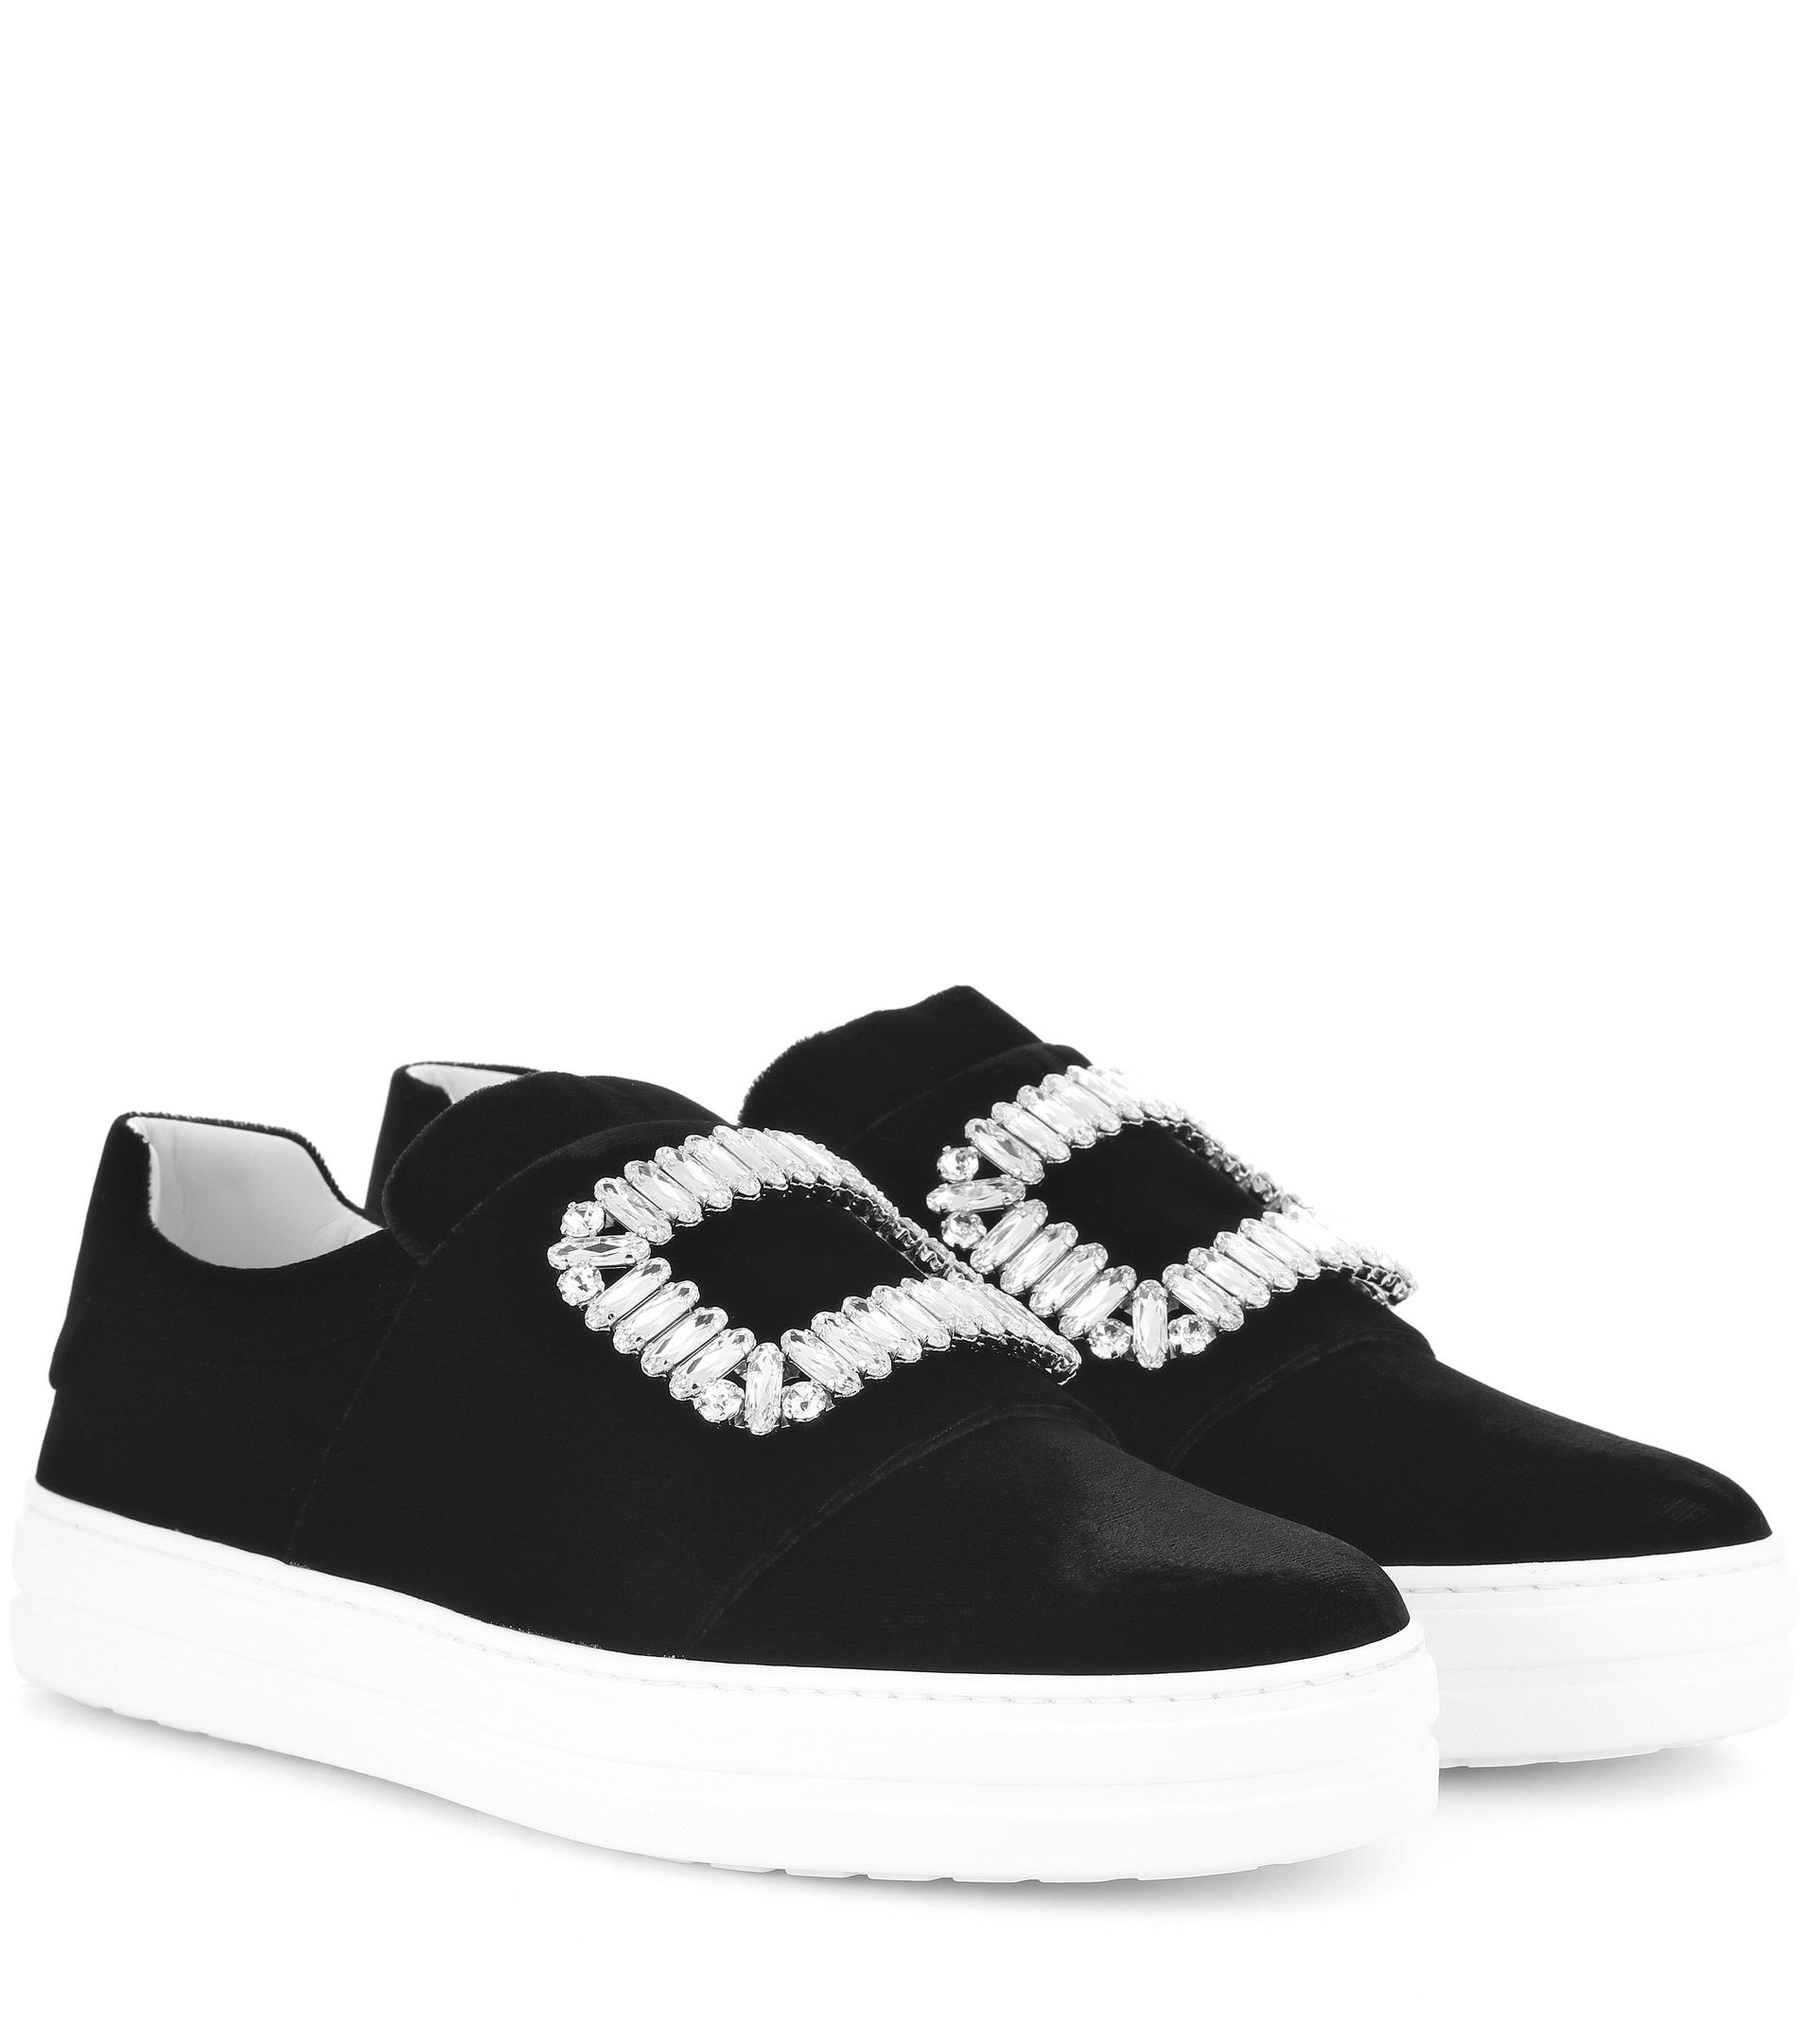 Roger Vivier. Women's Black Sneaky Viv Silk-Satin Sneakers